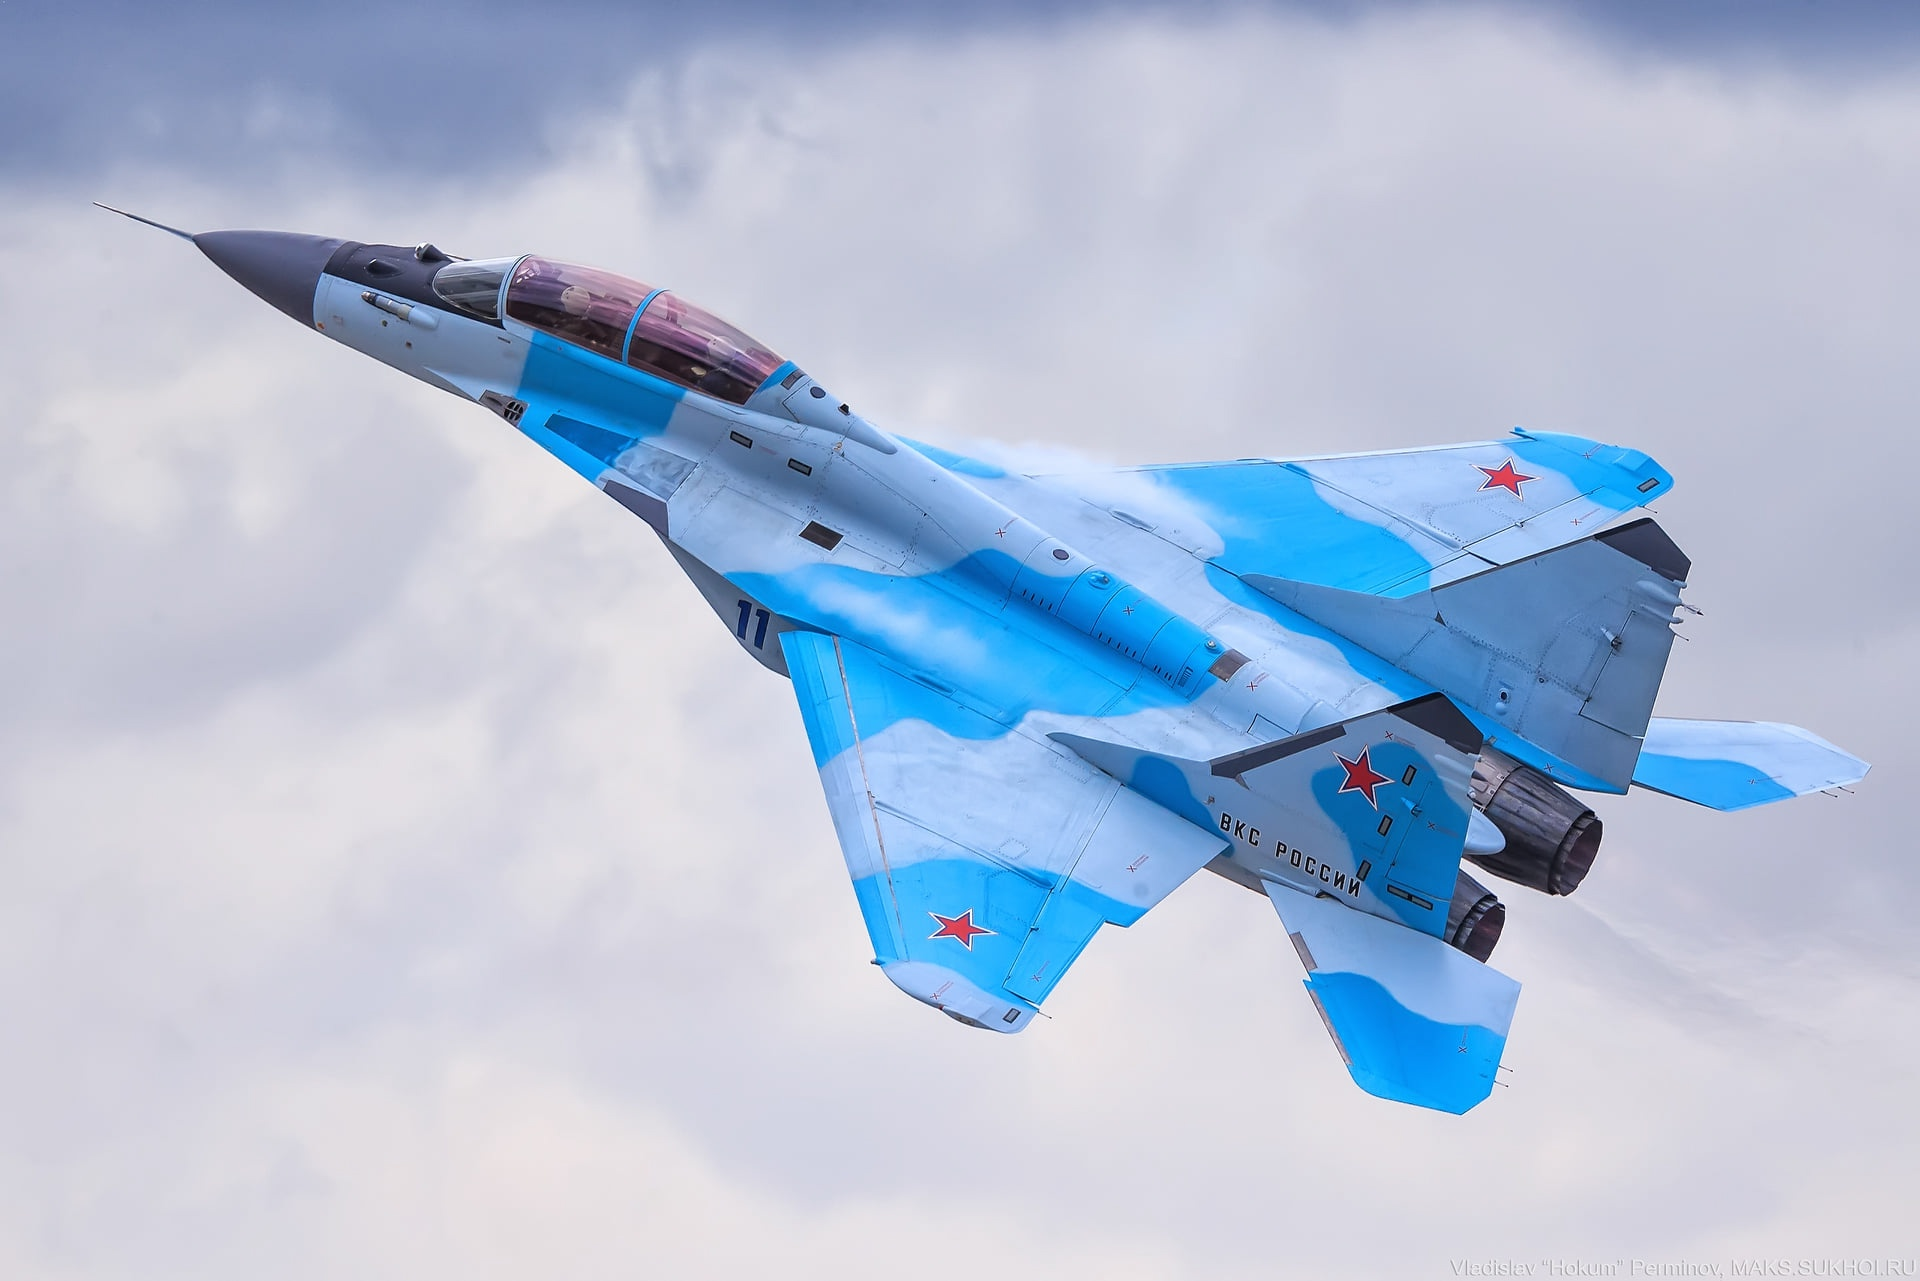 MiG-29/ΜiG-35 Fulcrum: News #2 - Page 20 E7JnKaxXsAsdtD7?format=jpg&name=large